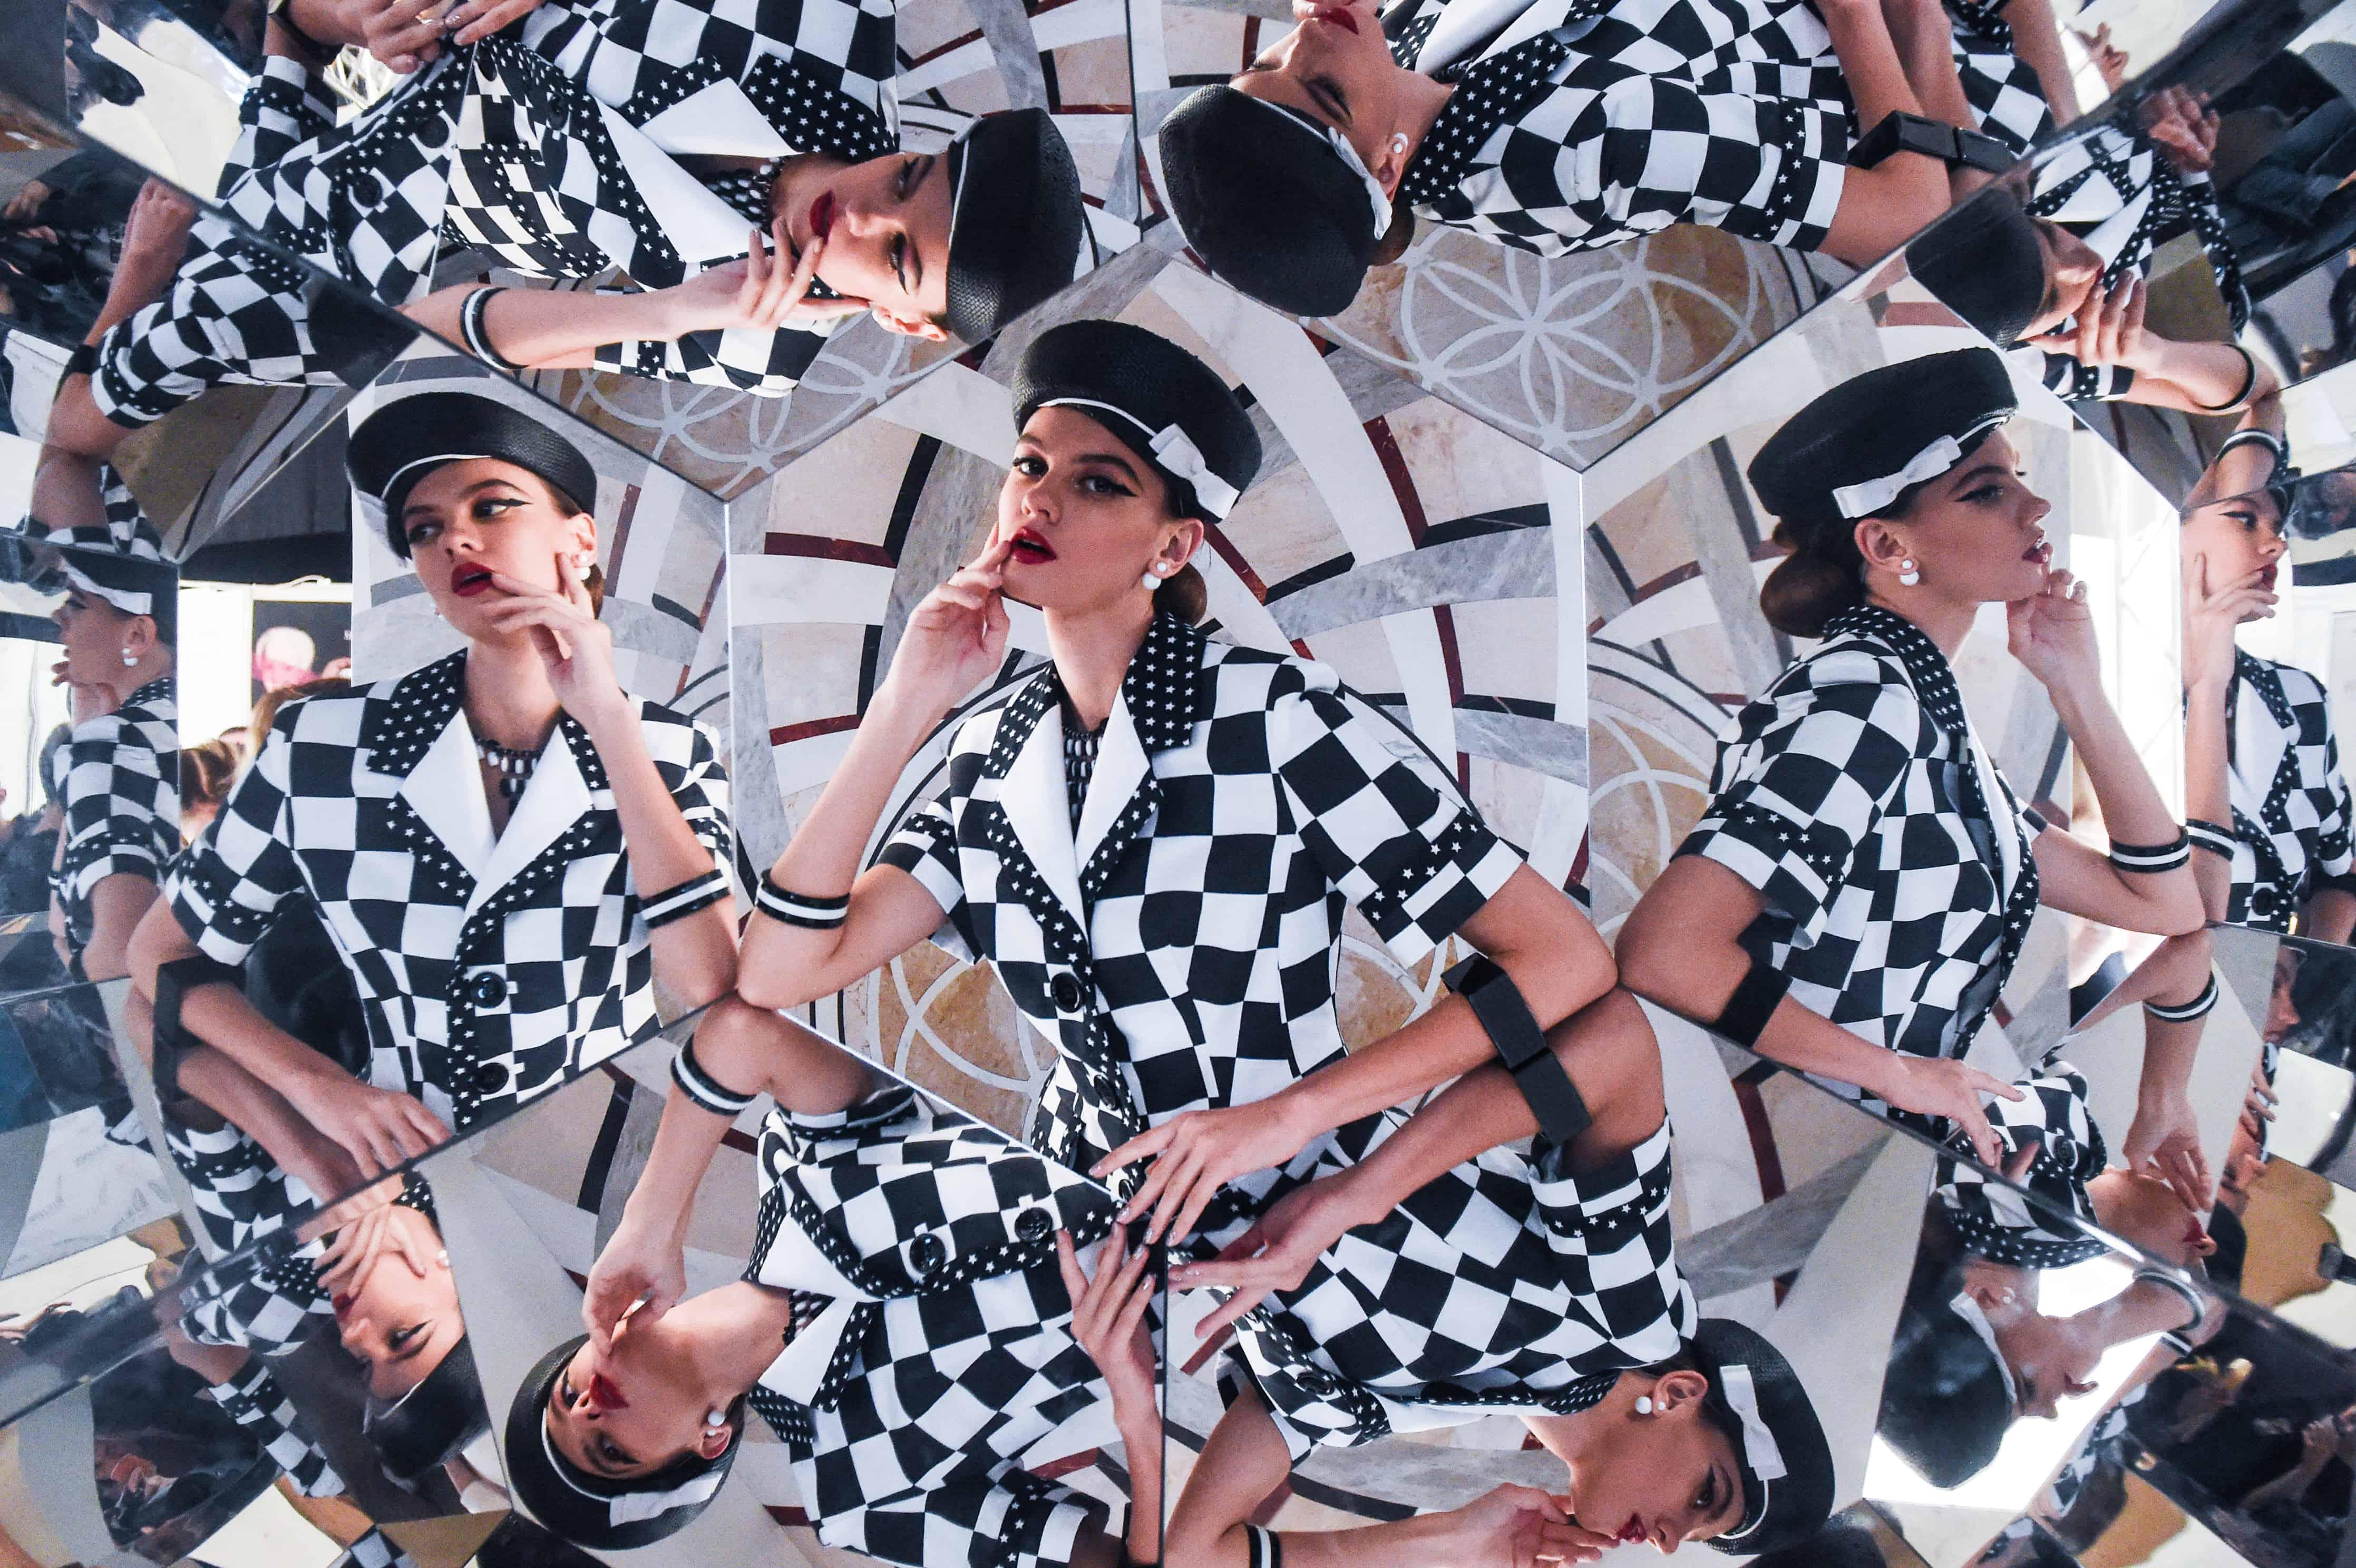 Photo of Открытие Mercedes-Benz Fashion Week ss'18.  Открытие Mercedes-Benz Fashion Week ss'18. Berezkin Viktor  vickor berezkin 38